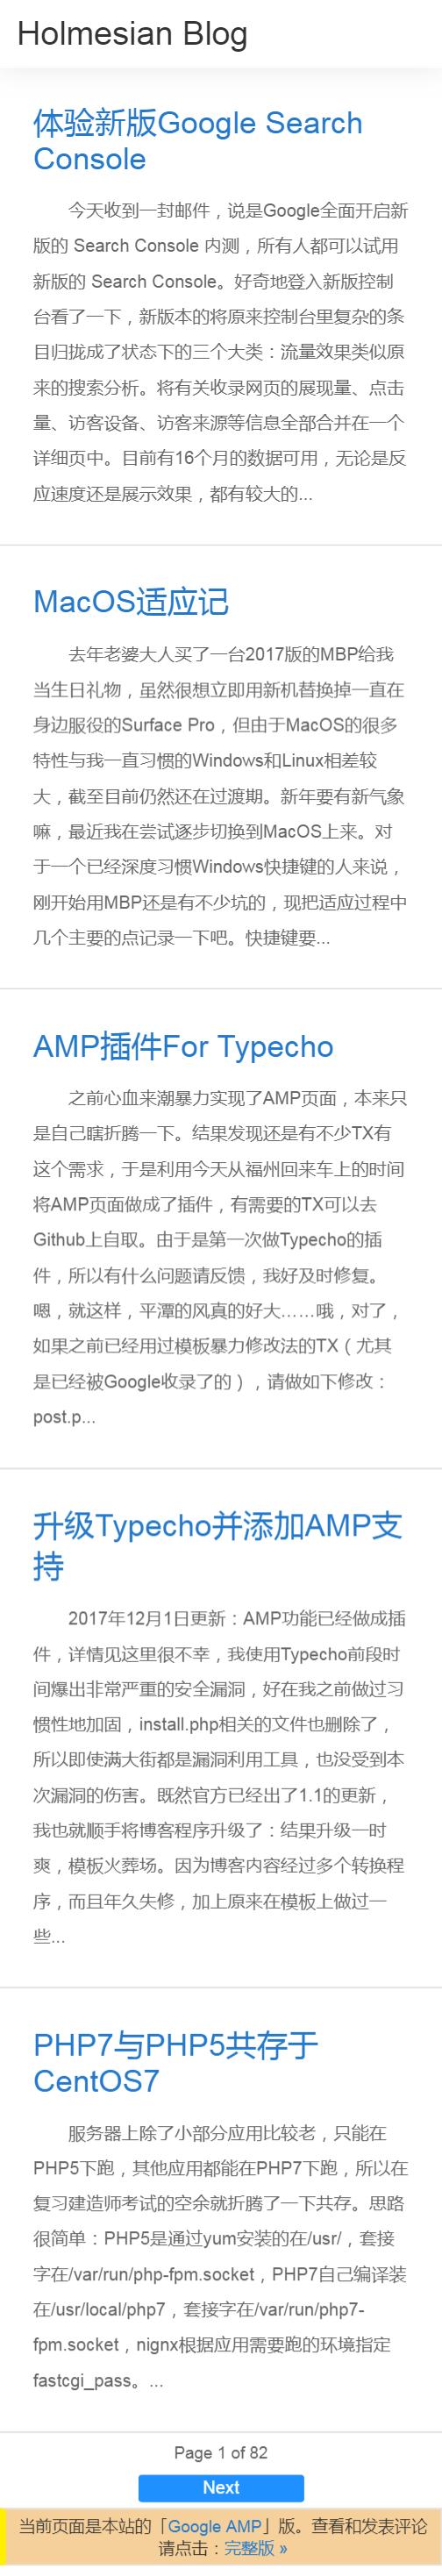 AMP首页